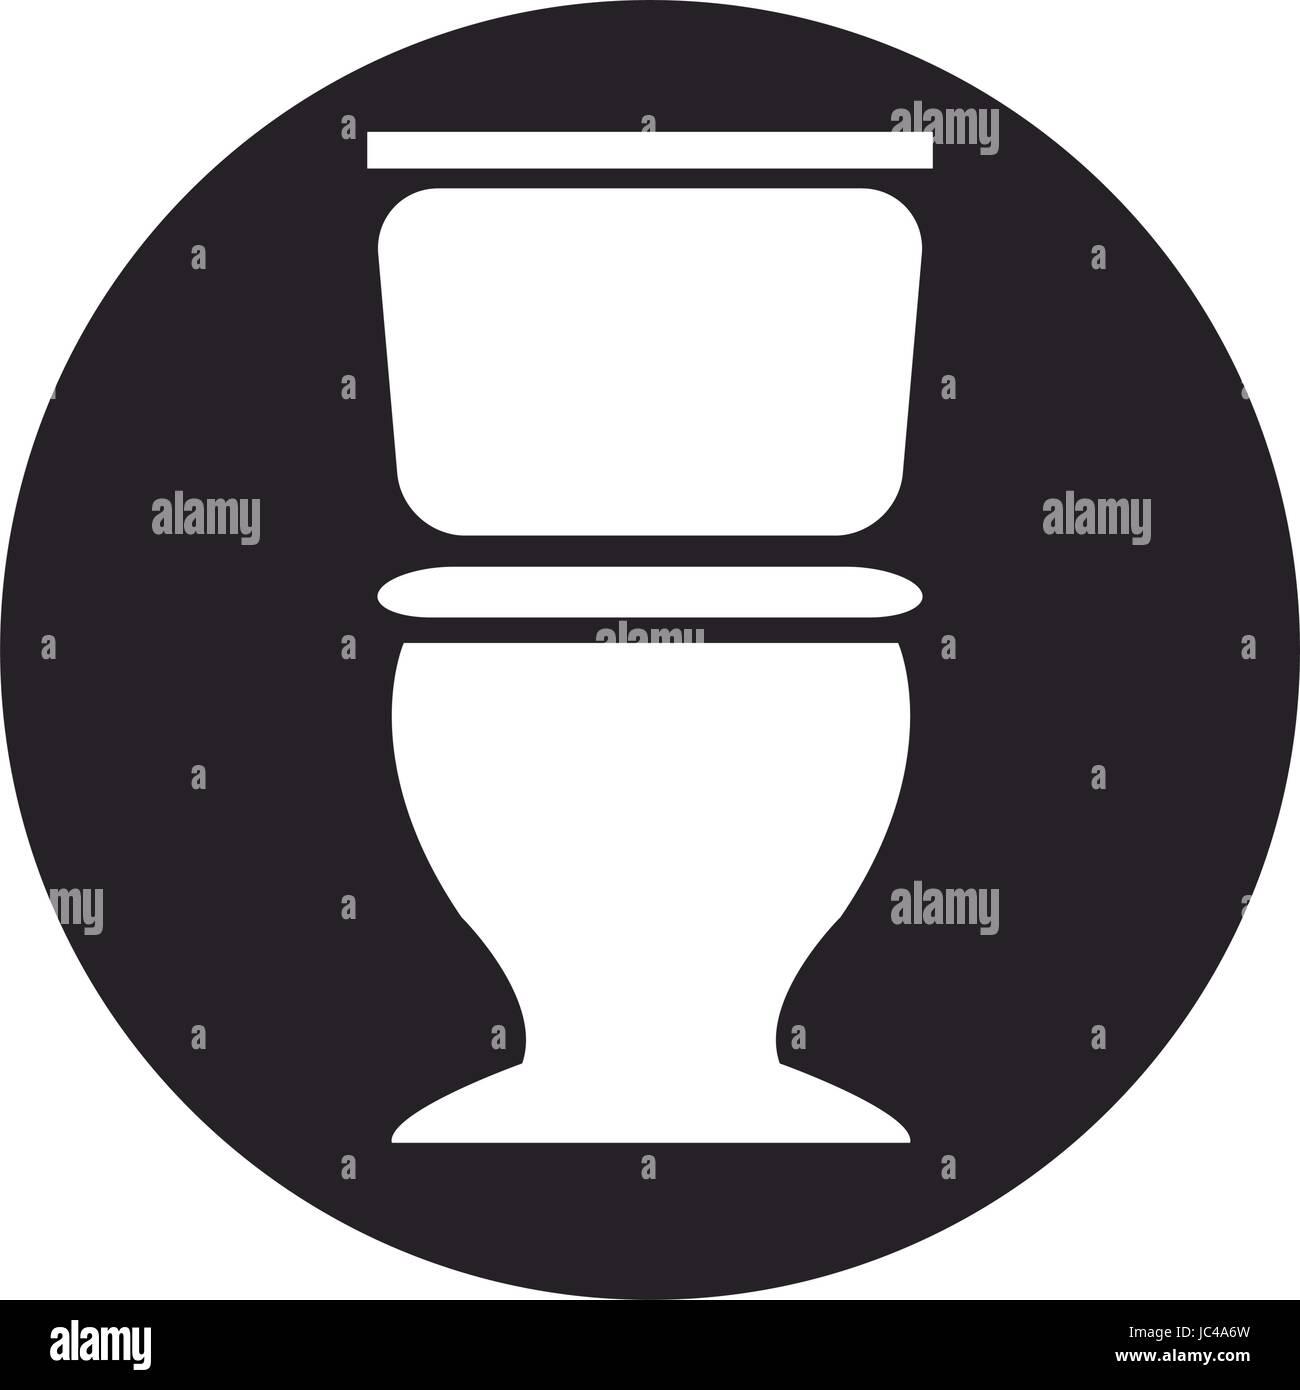 toilet bowl vector illustration isolated stockfotos. Black Bedroom Furniture Sets. Home Design Ideas